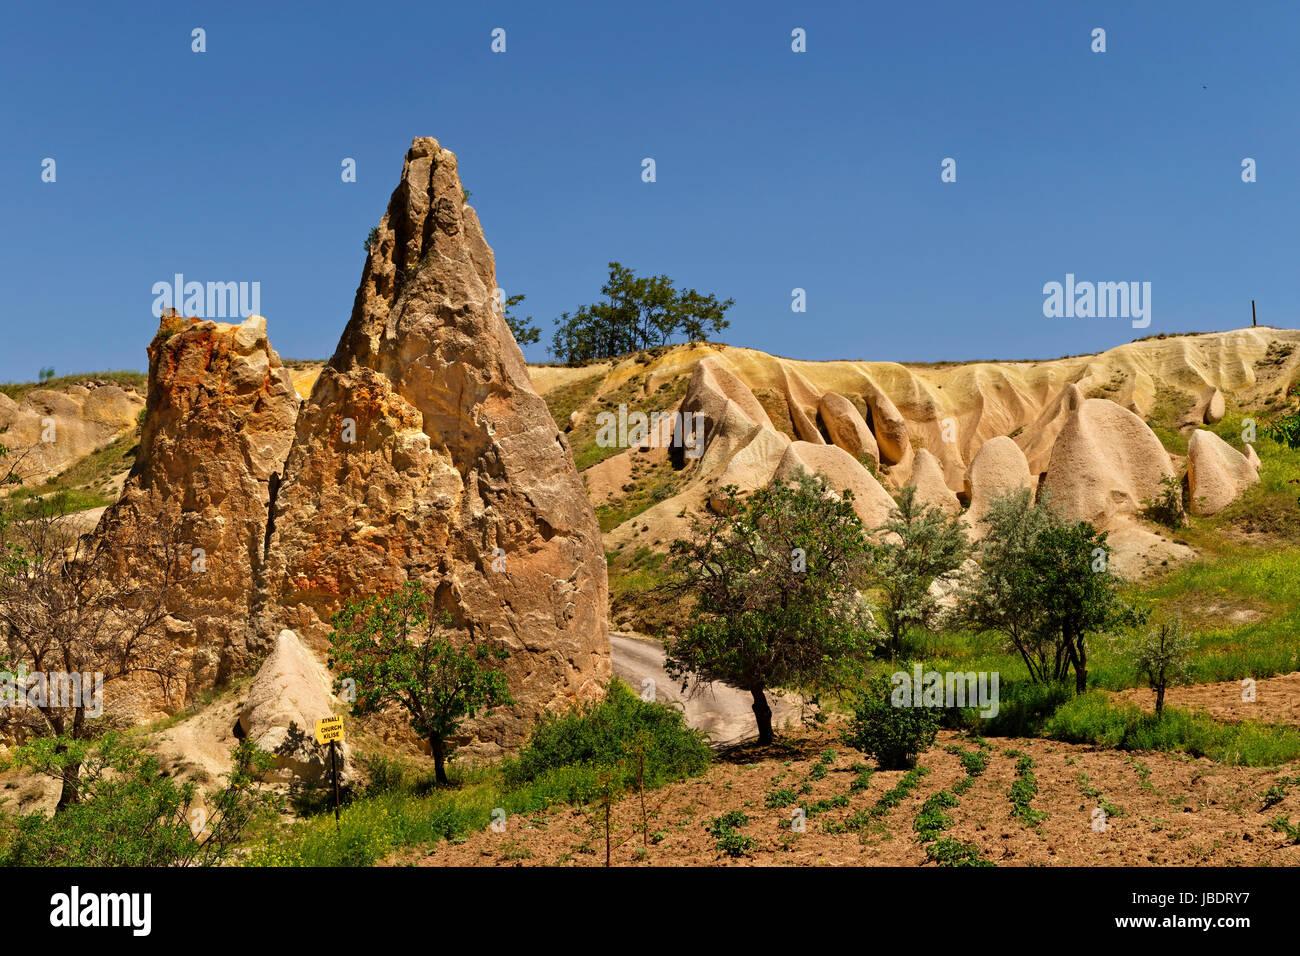 Goreme National Park, Cappadocia, Turkey - Stock Image